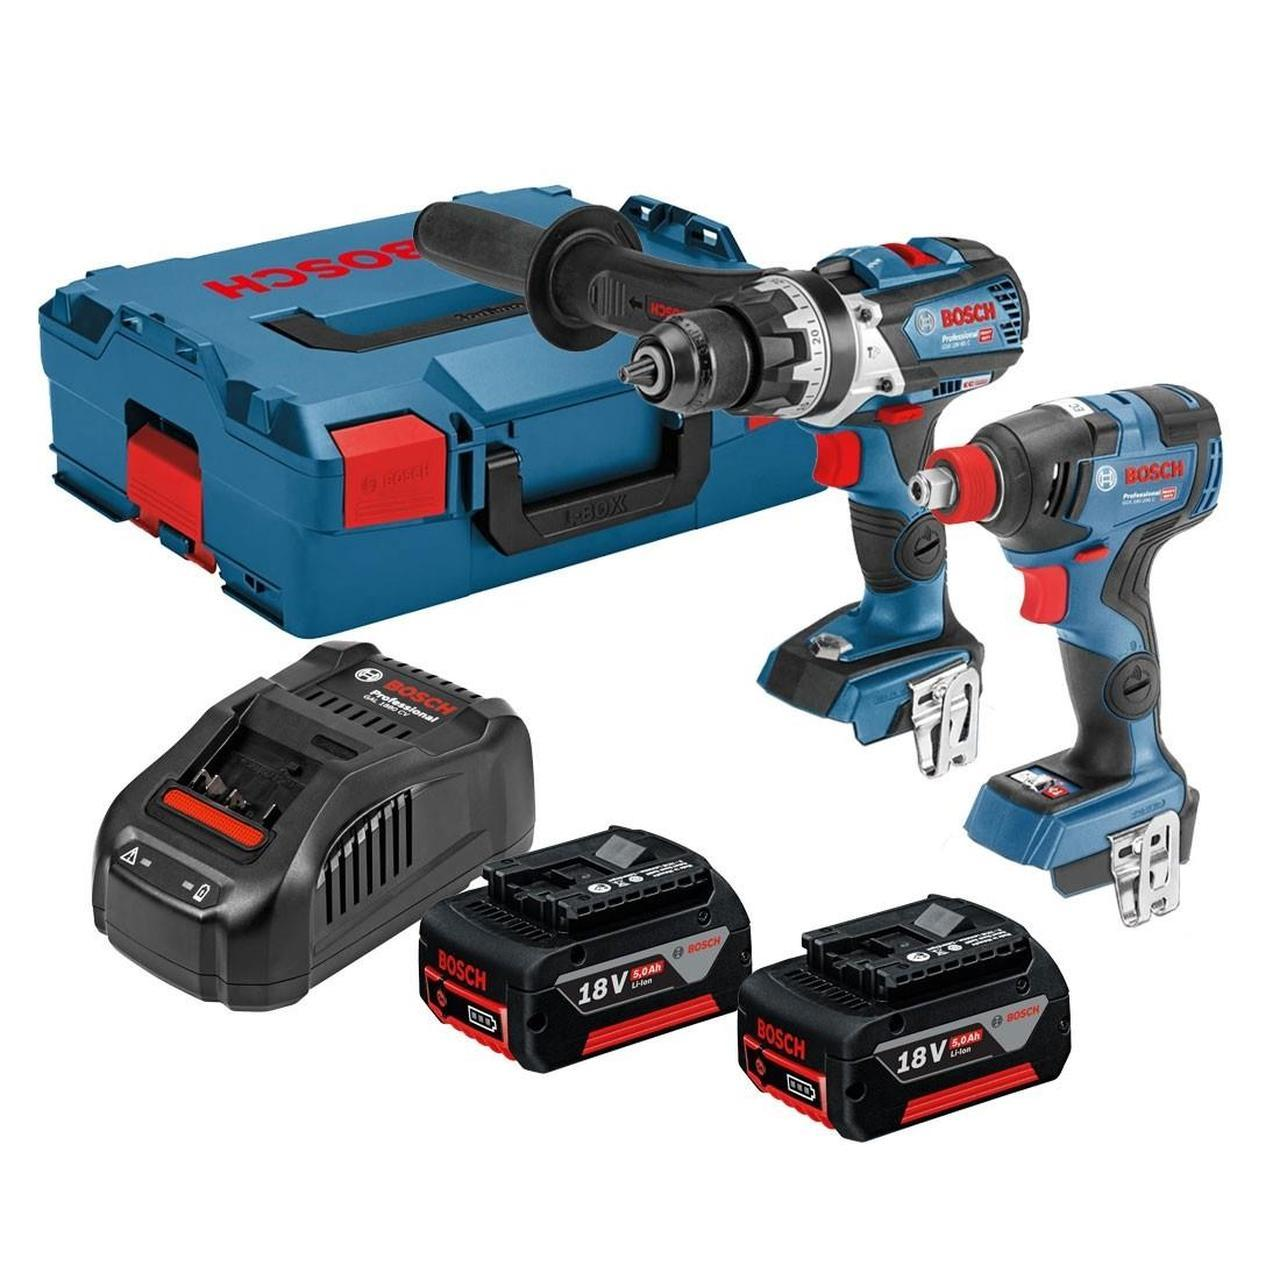 Bosch Tool Kits